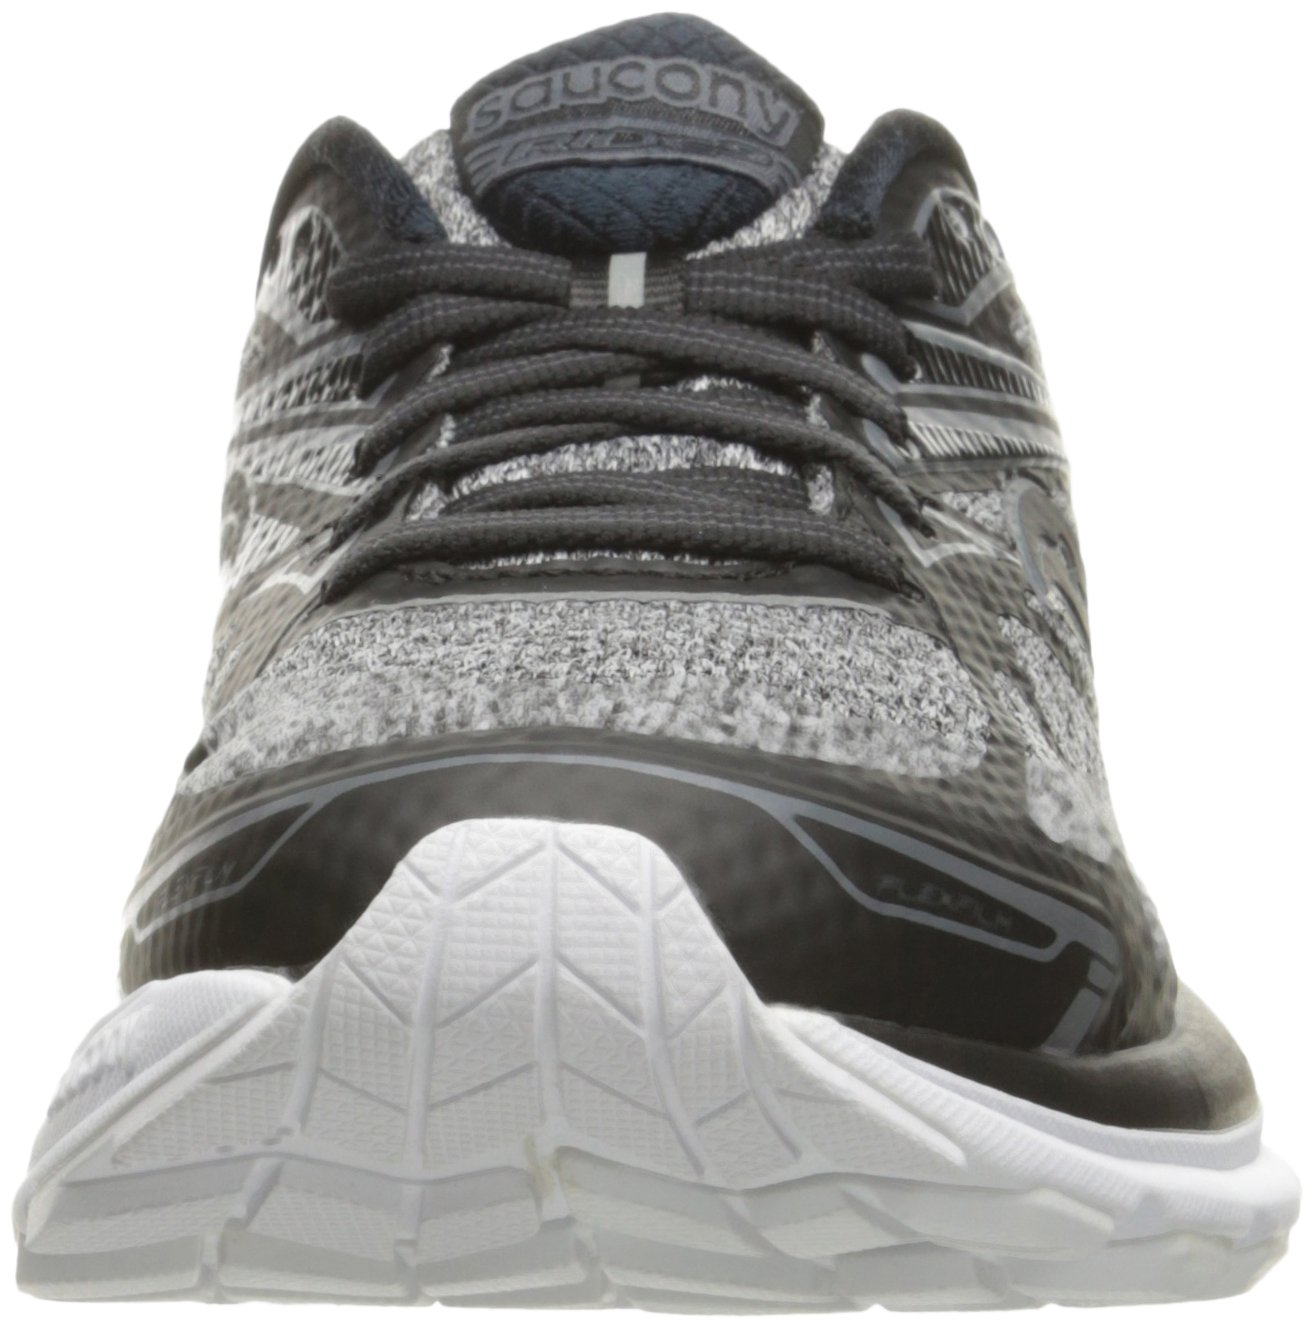 71iw%2BTd%2BxvL - Saucony Women's Ride 9 Lr Running Shoe, Grey/Black, 5 M US